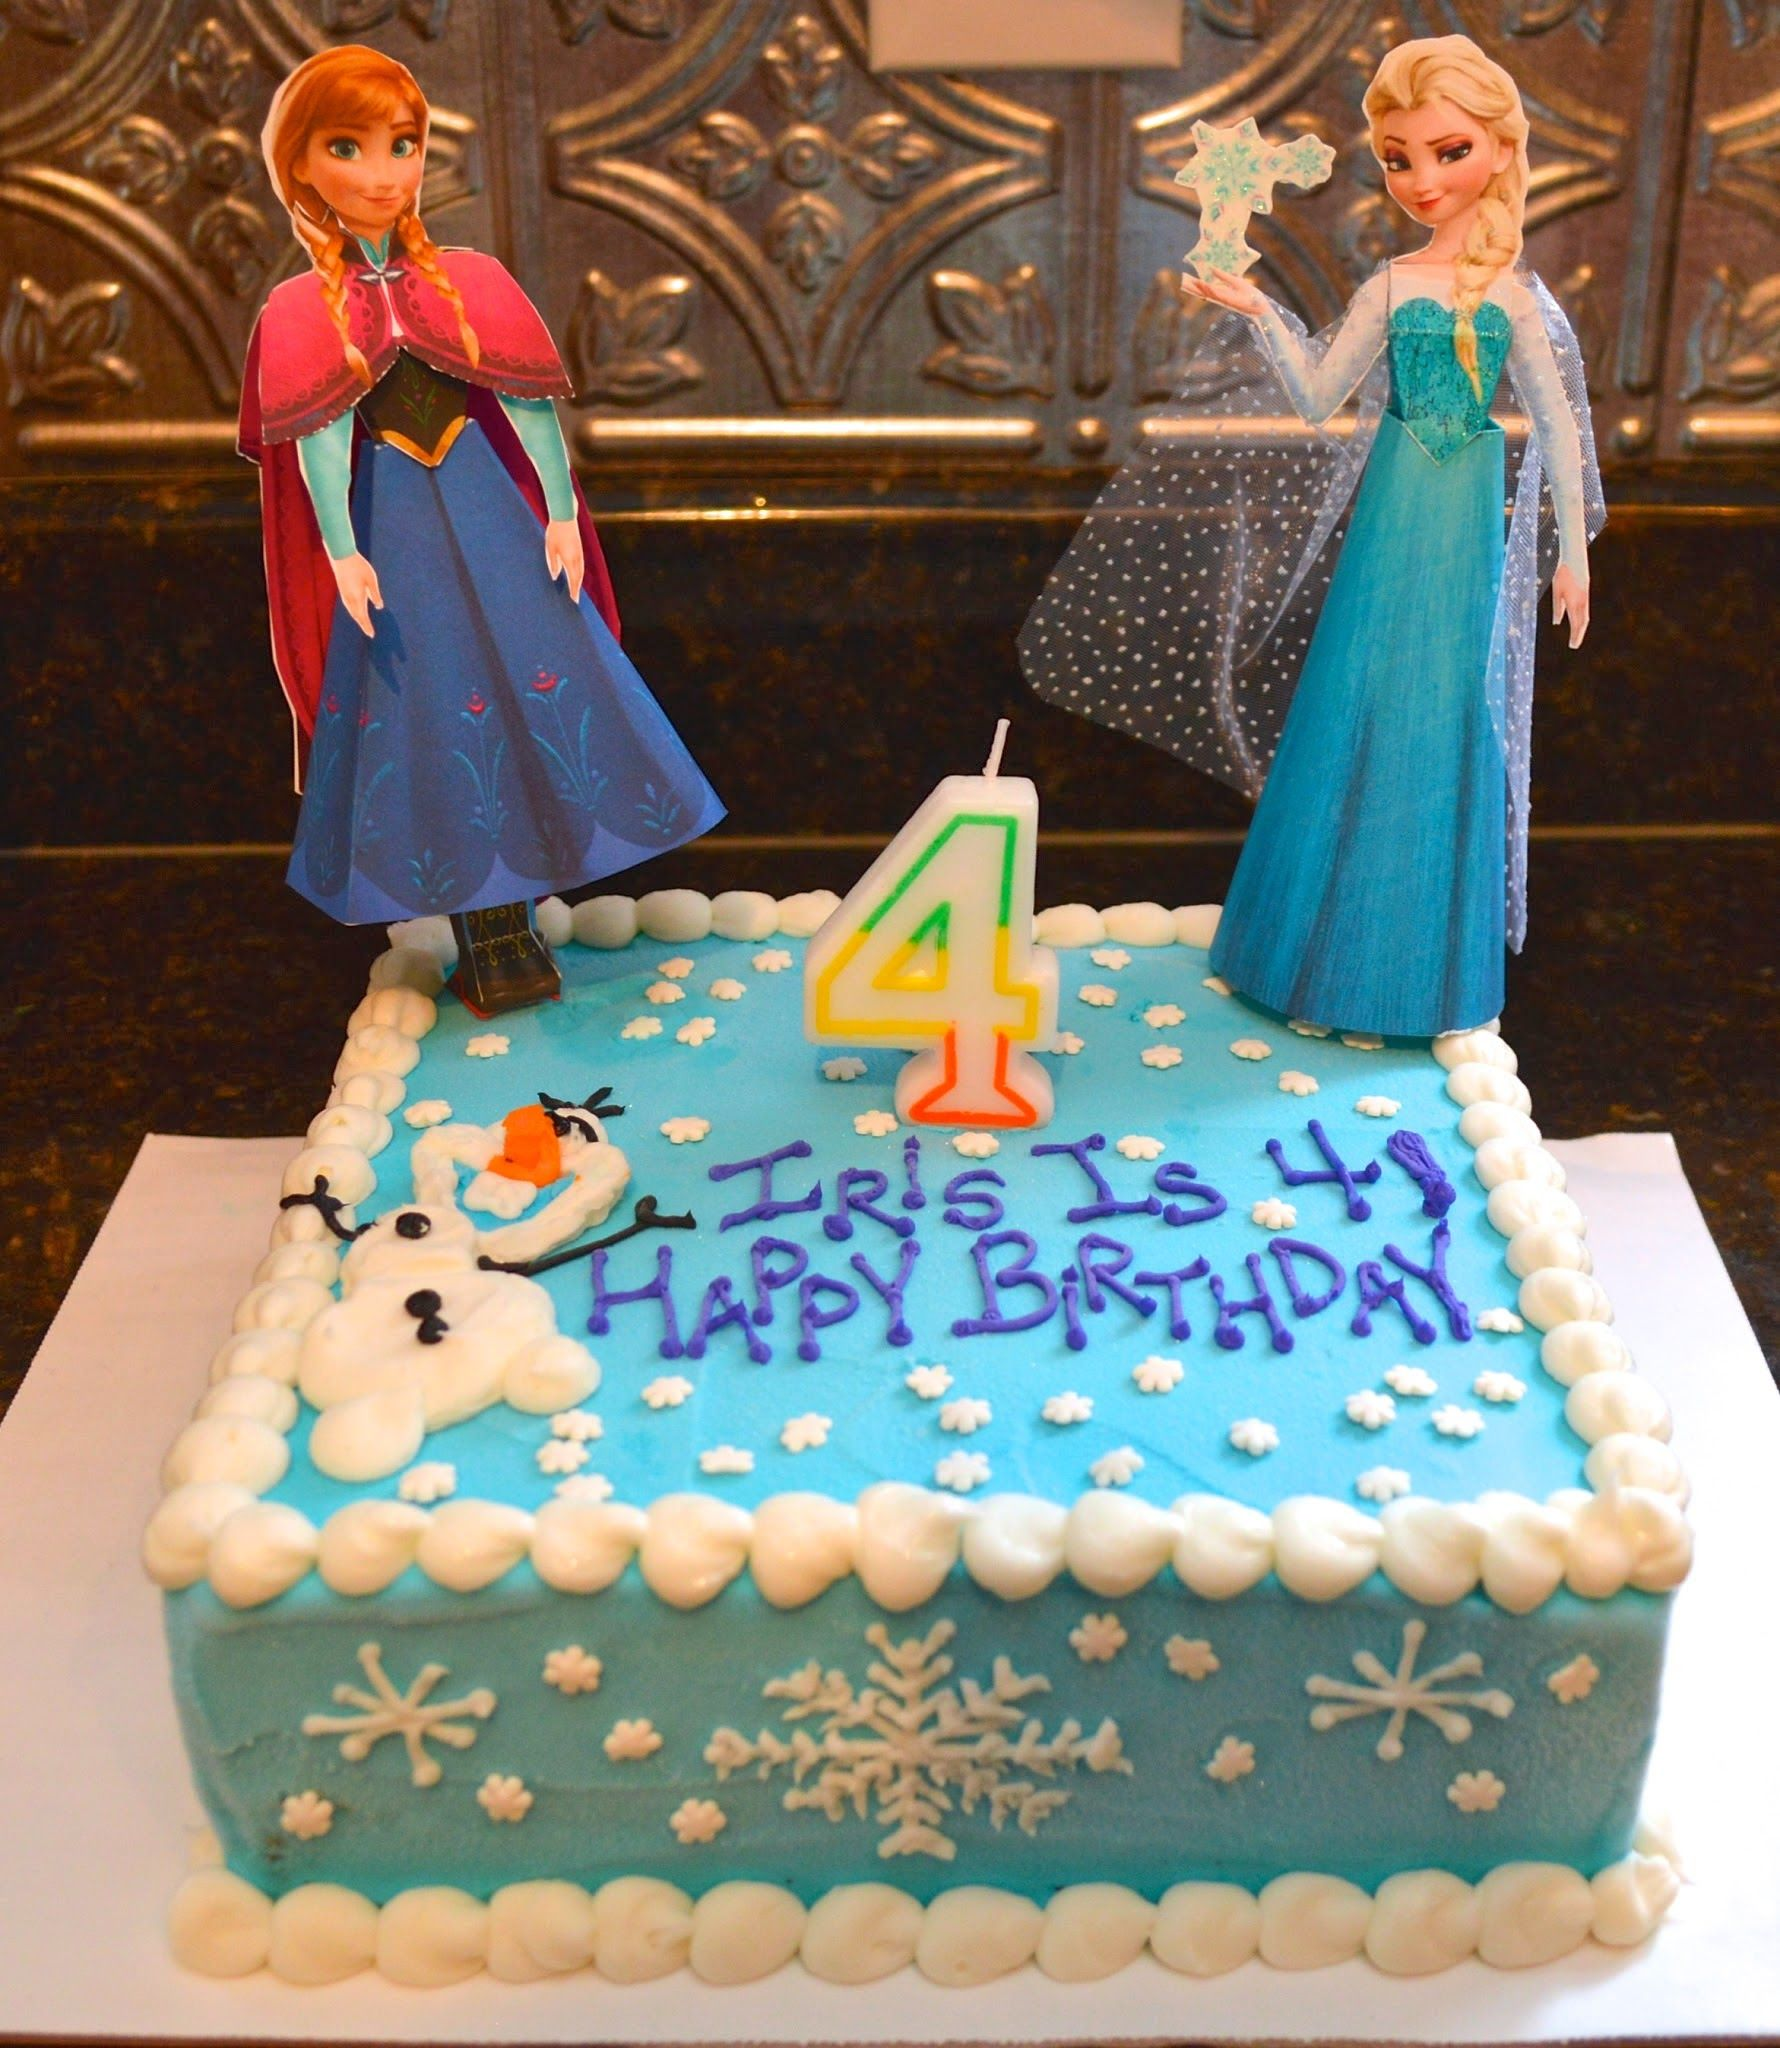 Beth Being Crafty The Diy Frozen Birthday Frozen Bday Party